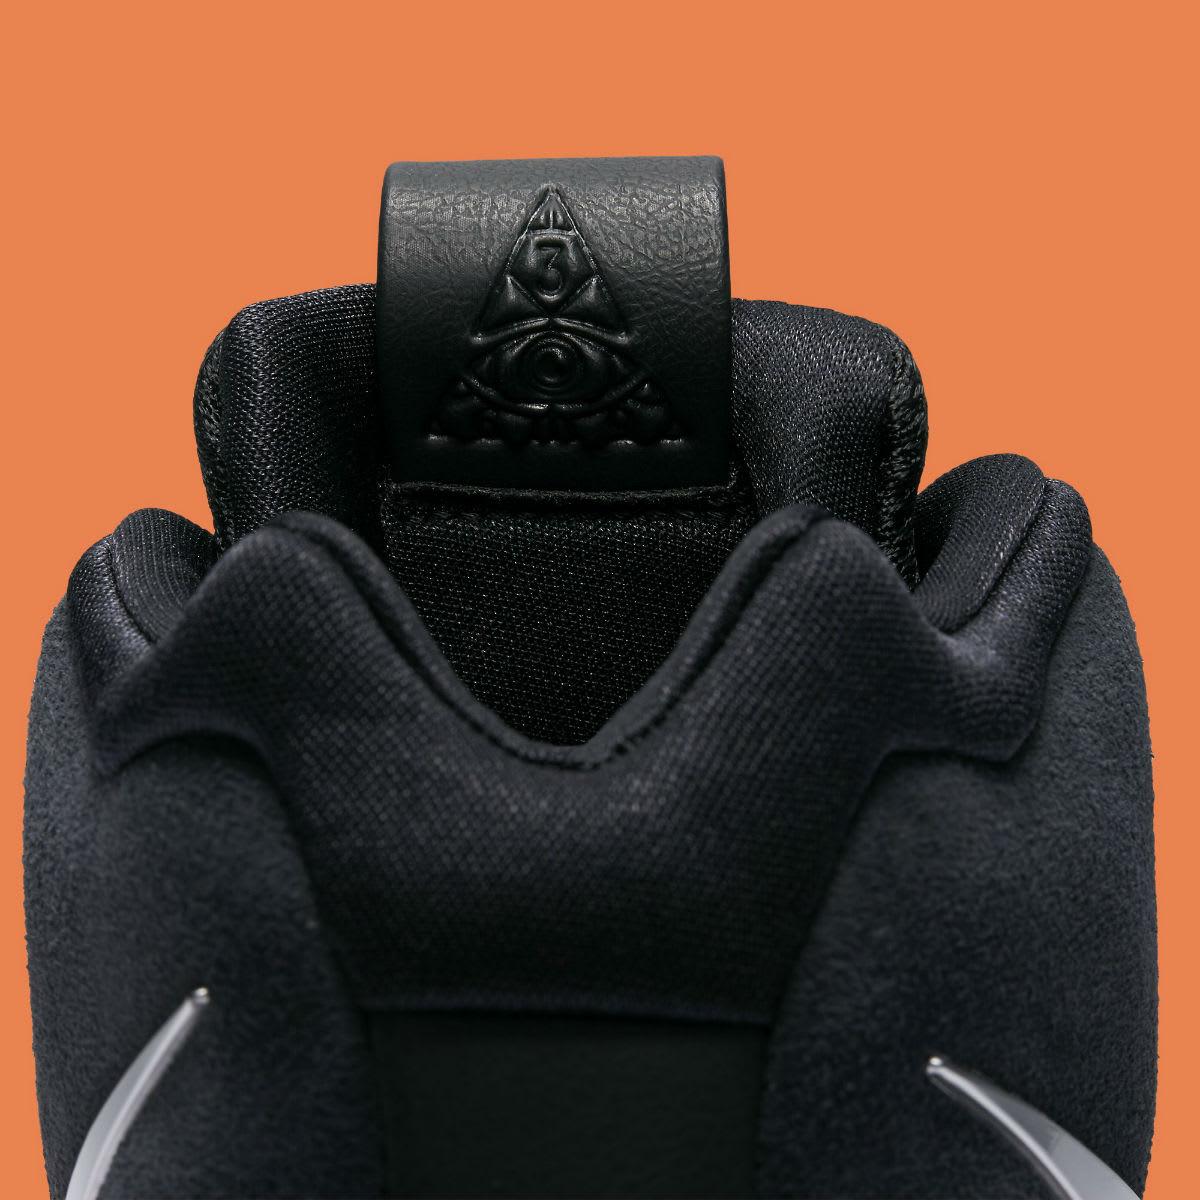 Nike Kyrie 4 Black/Silver-Orange Release Date 943806-010 Tongue